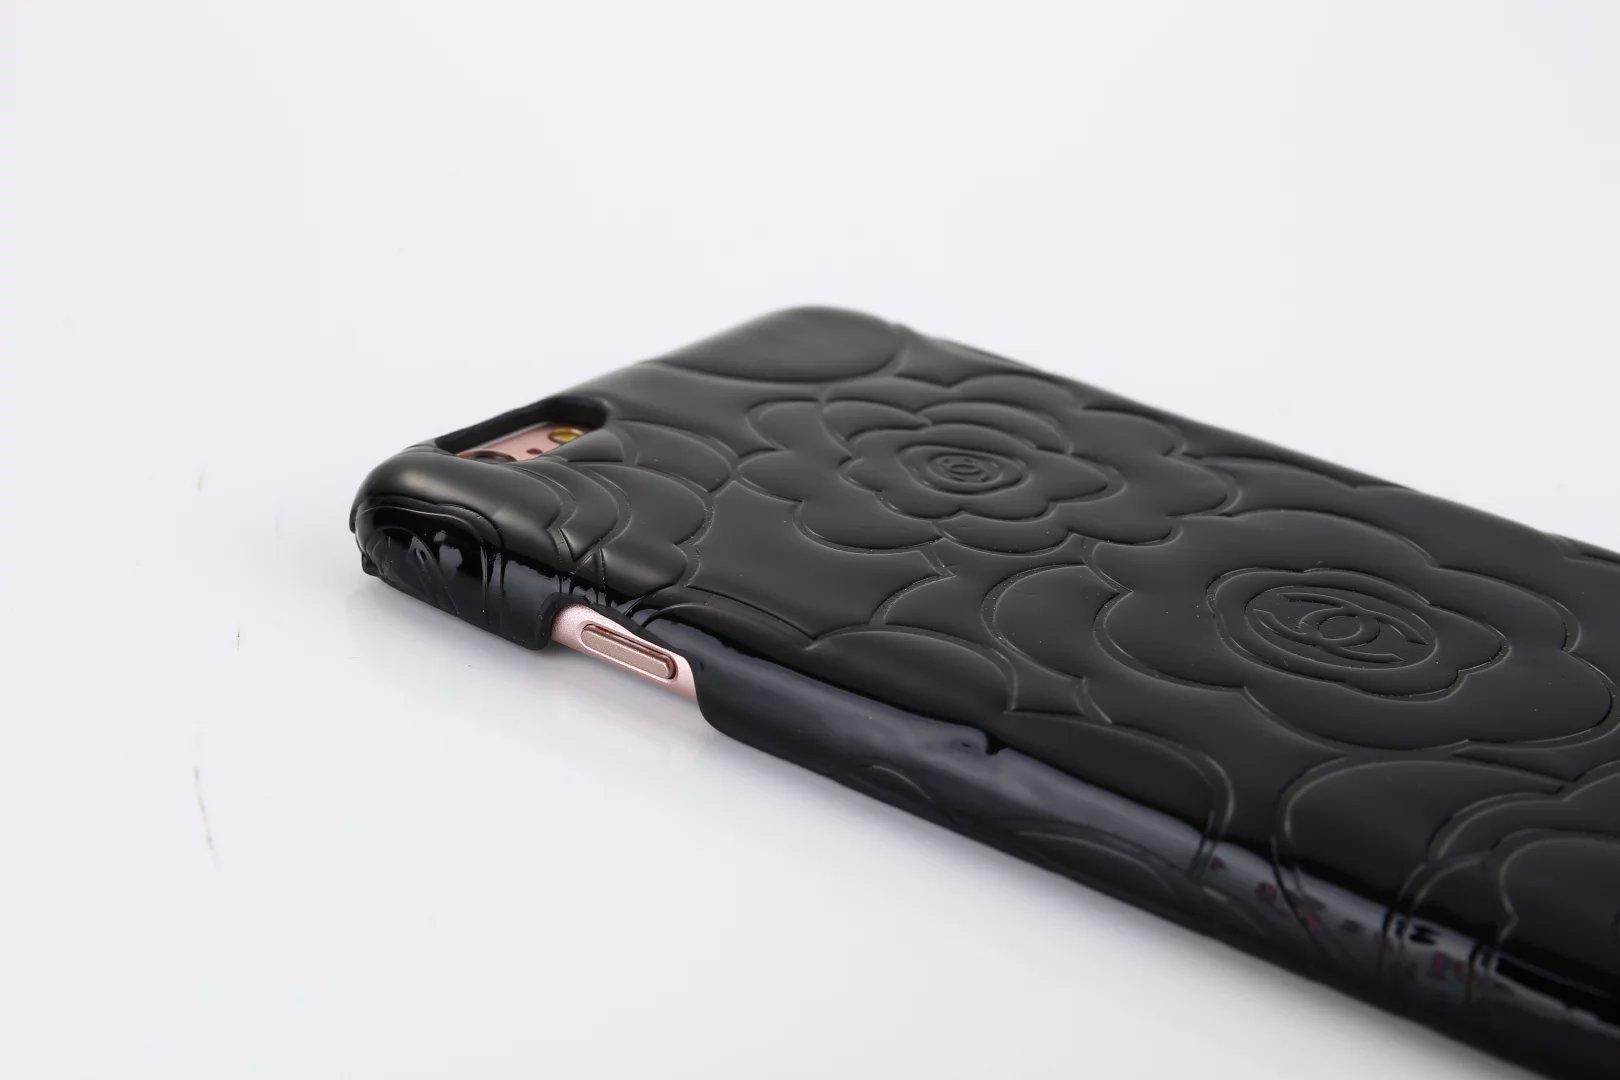 iphone case foto iphone hülle mit foto bedrucken Chanel iphone 8 Plus hüllen ca8 Plus E foto handyschale 8 Plus hülle apple handyhüllen für htc one mini iphone hülle mit kartenfach htc one handyhülle 8 Pluslbst gestalten